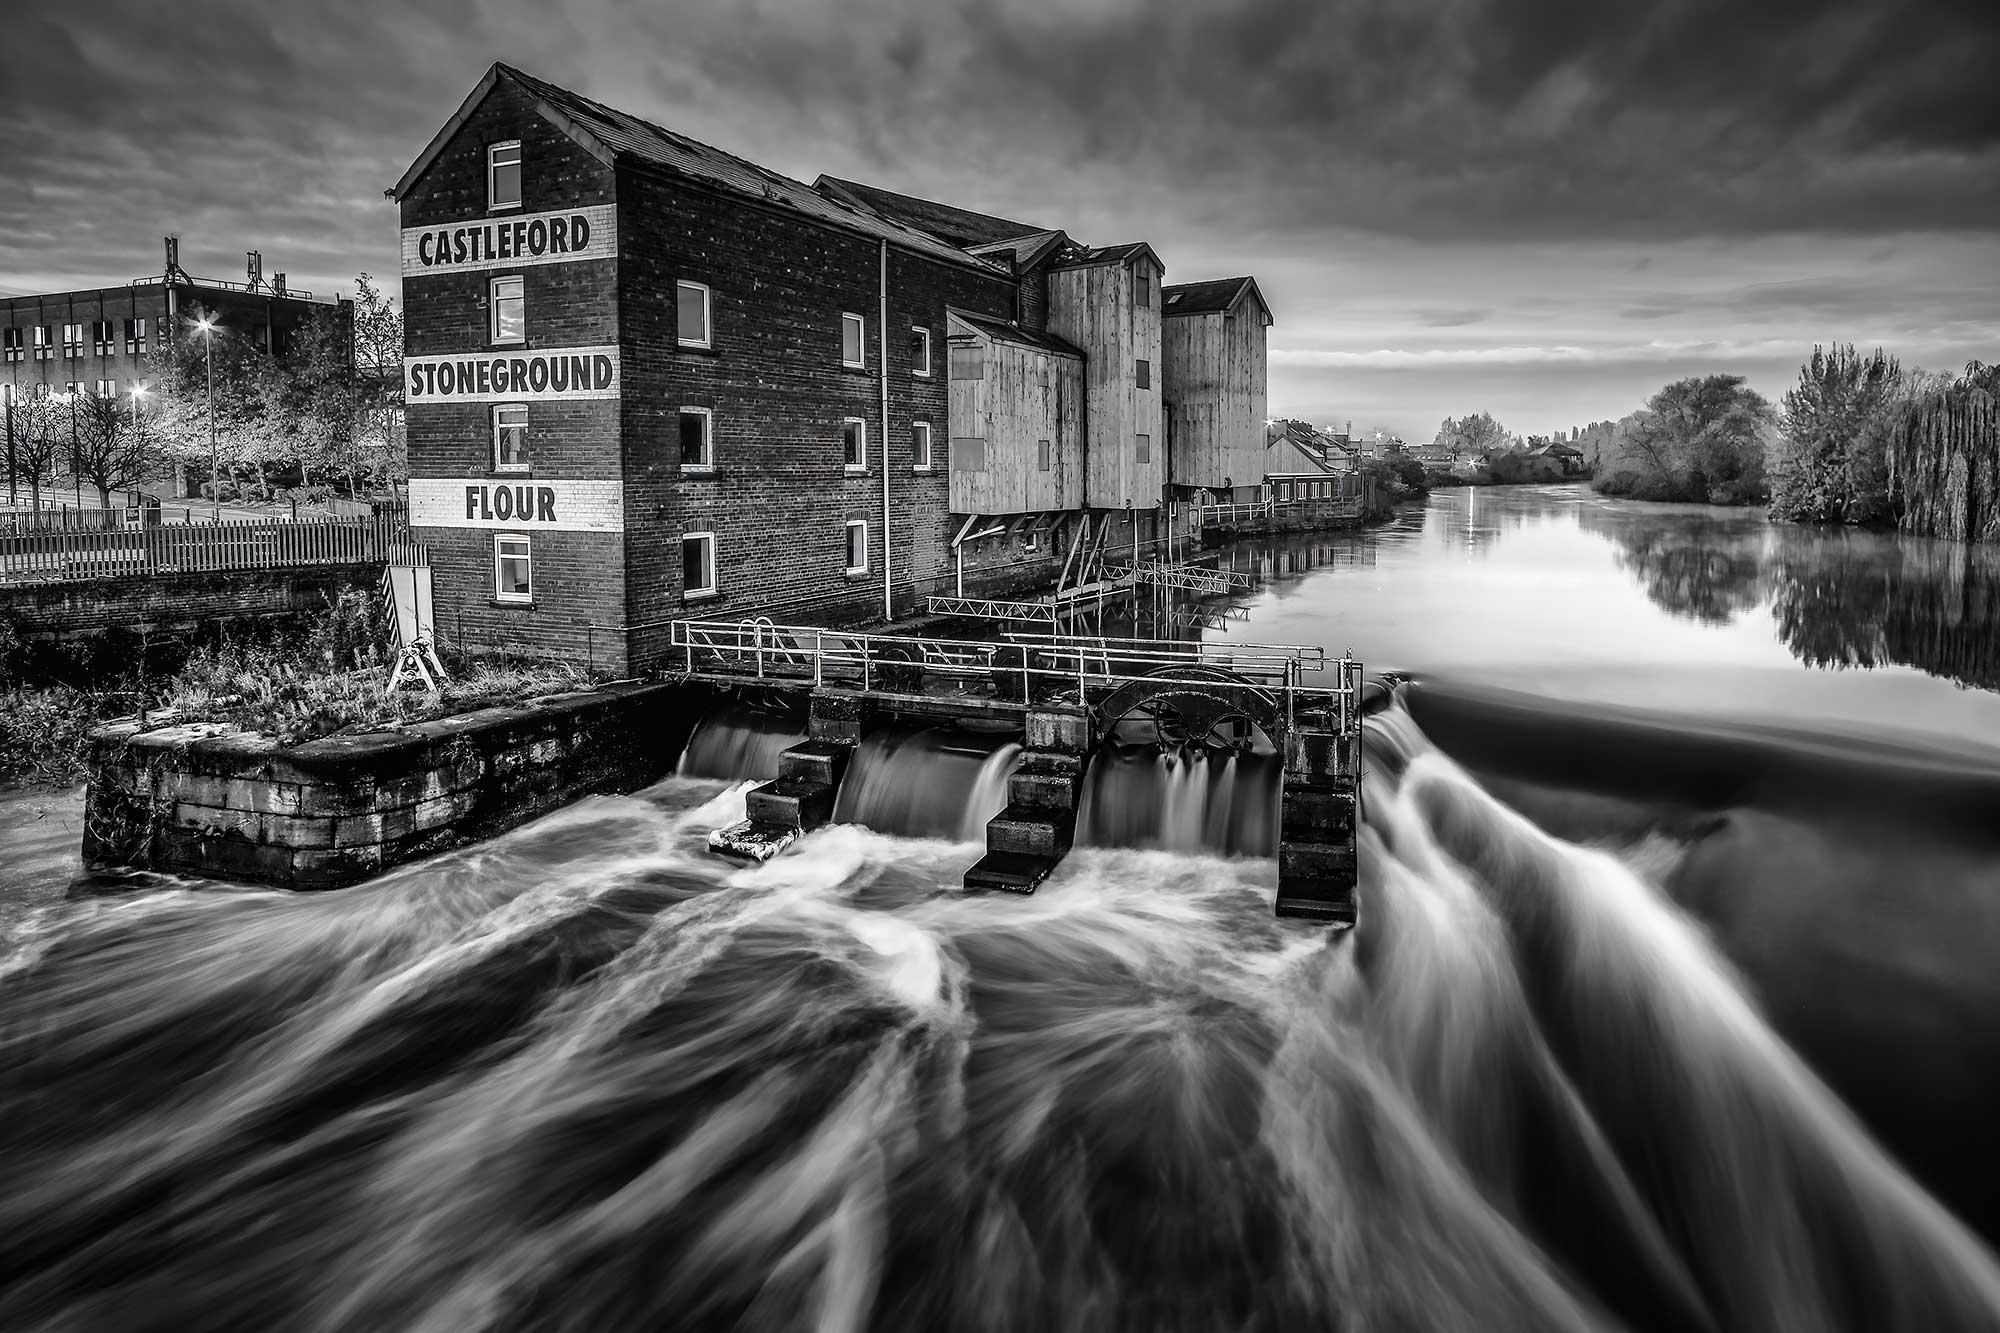 Castleford Flour Mill